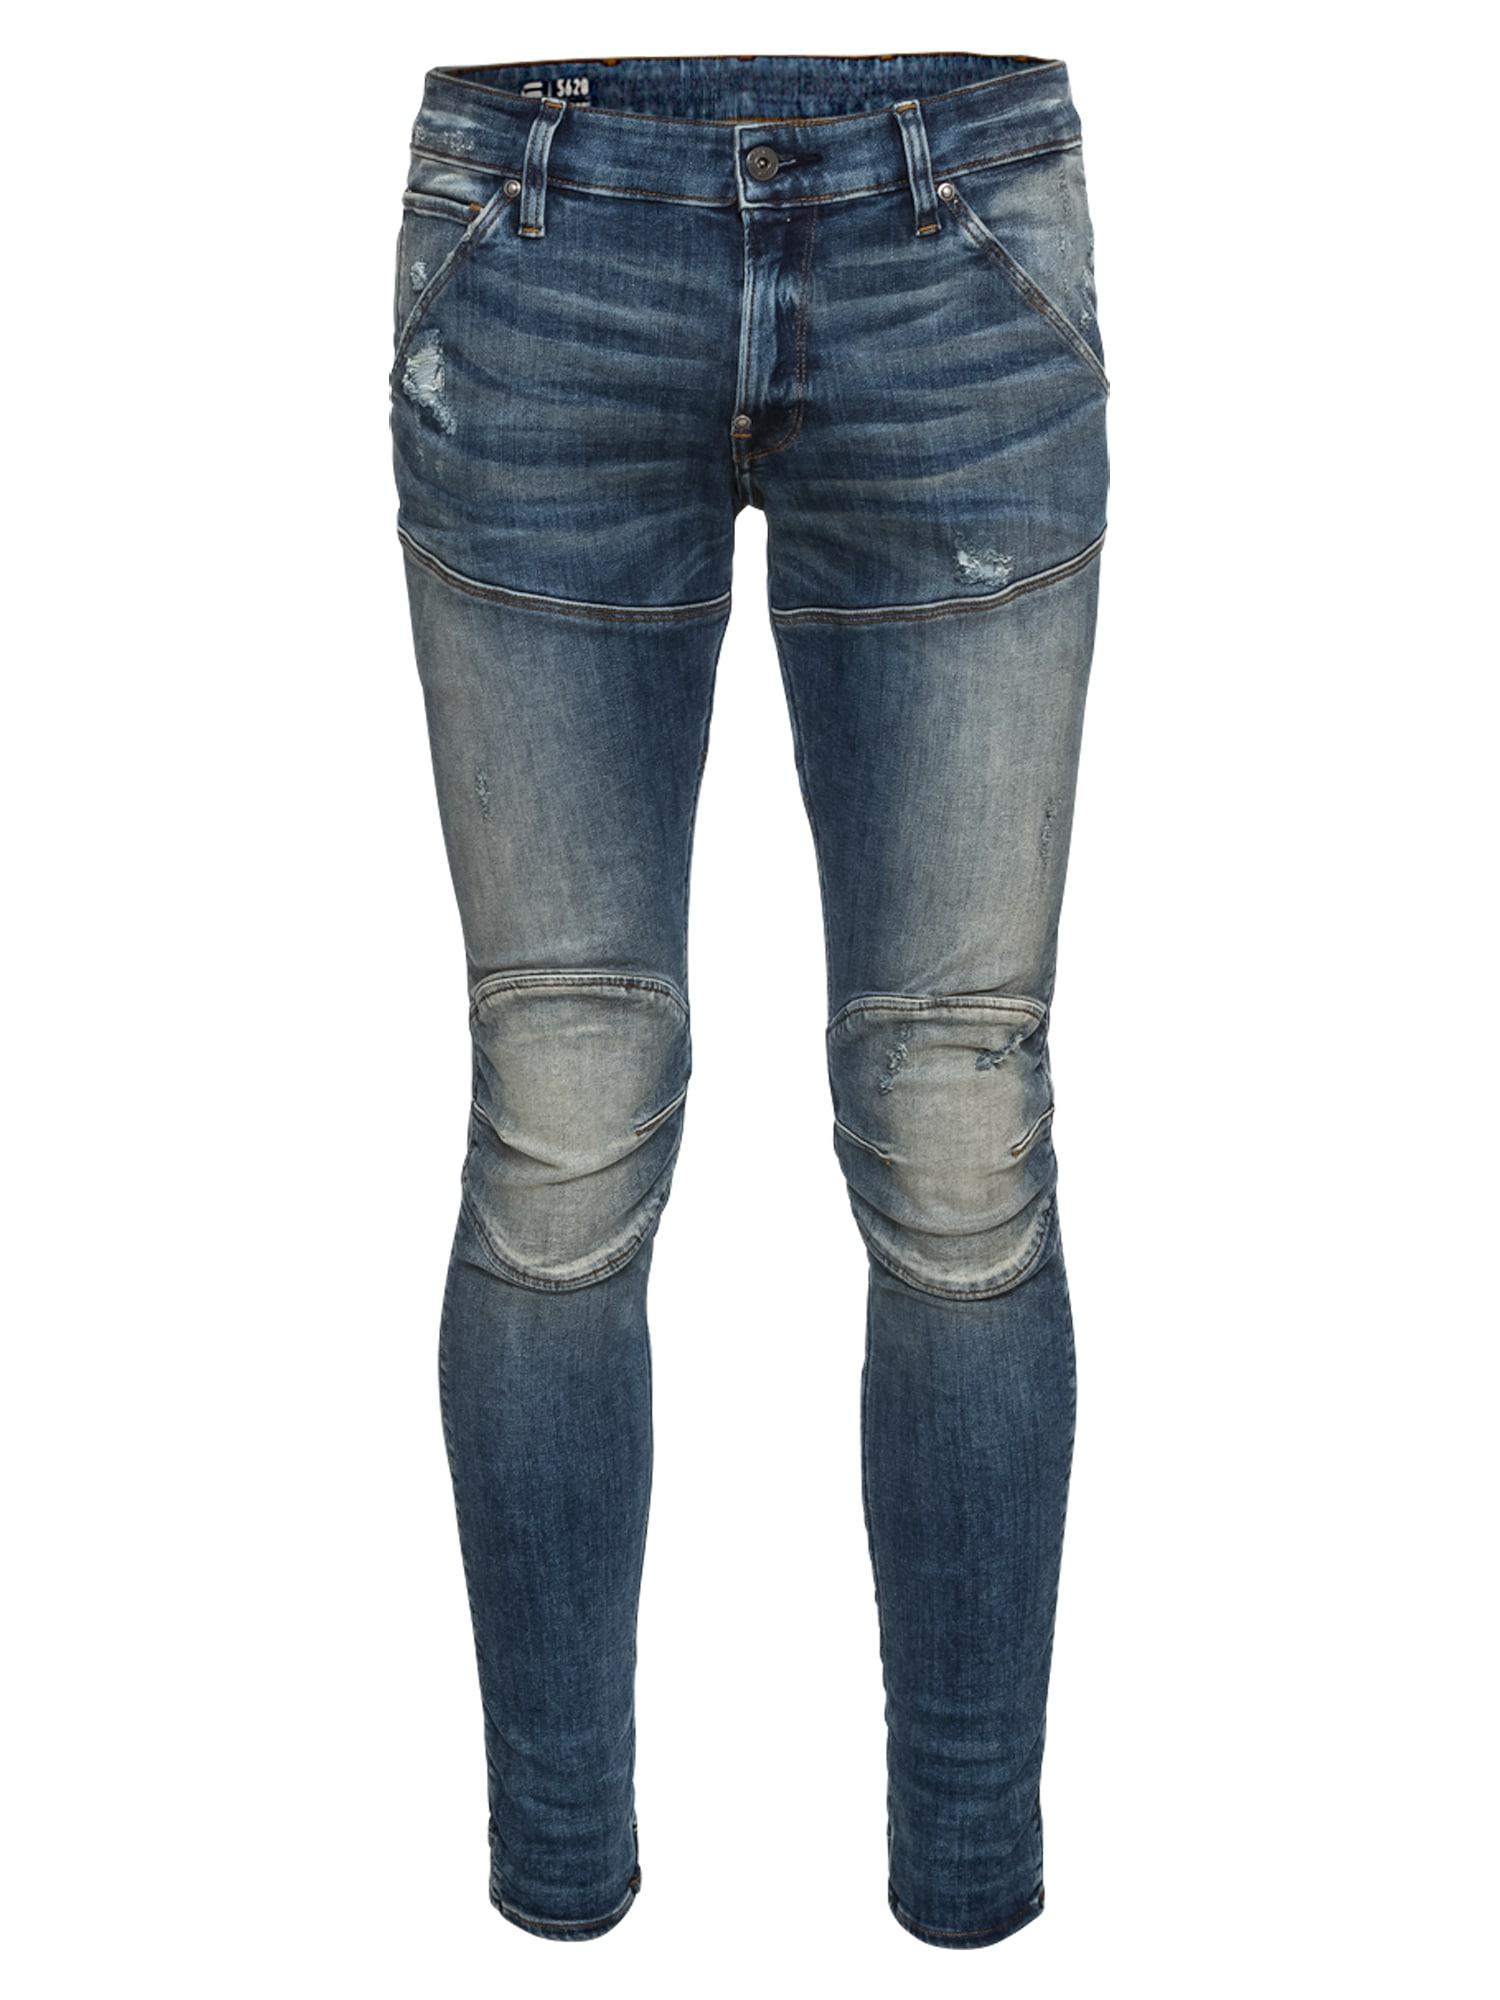 G-STAR RAW Heren Jeans Elwood Super-Slim blauw denim